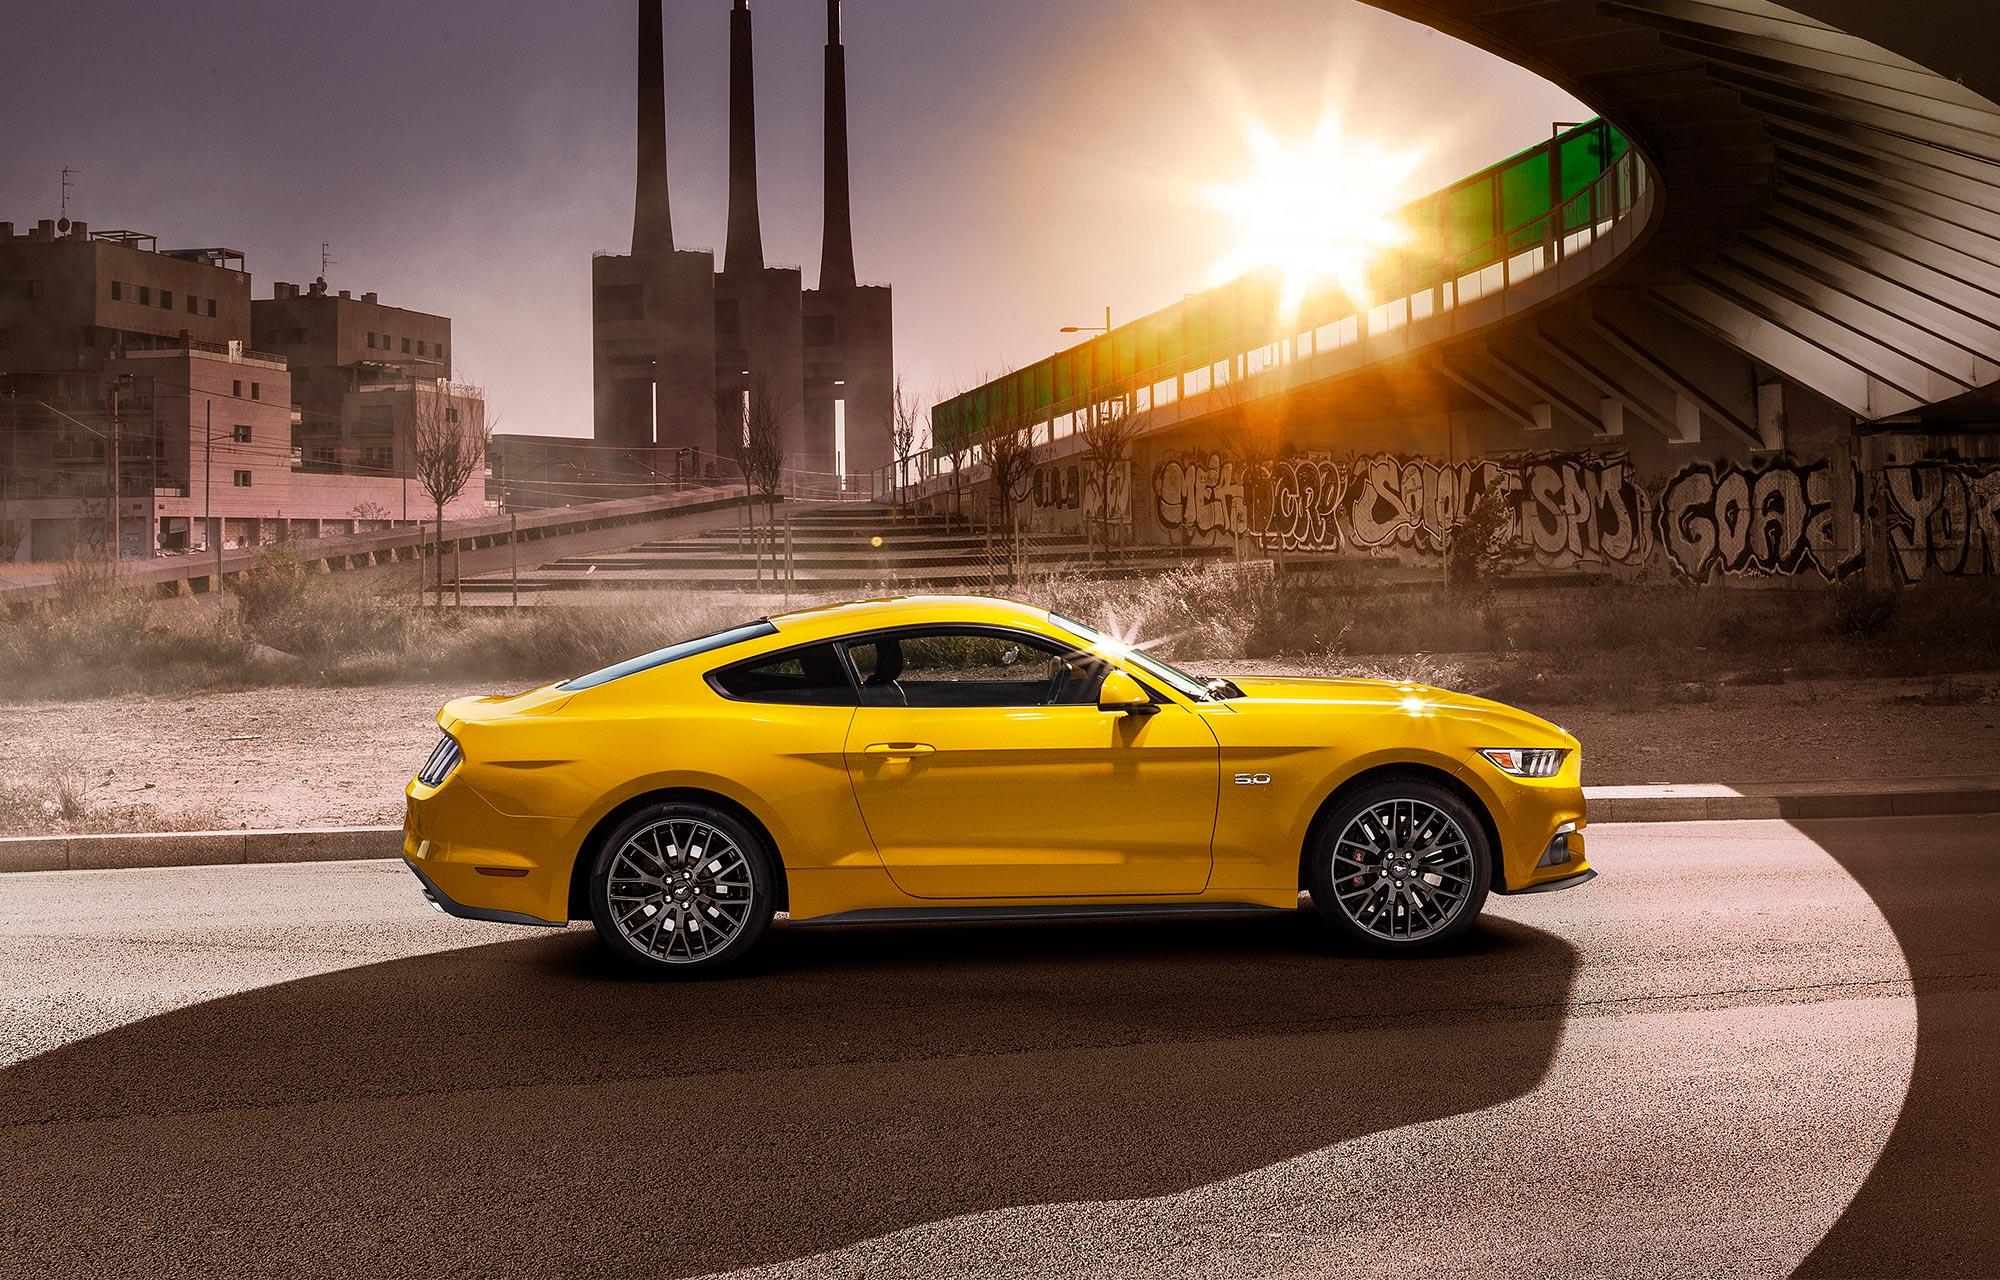 Ford Mustang myydyin urheiluauto 2015!